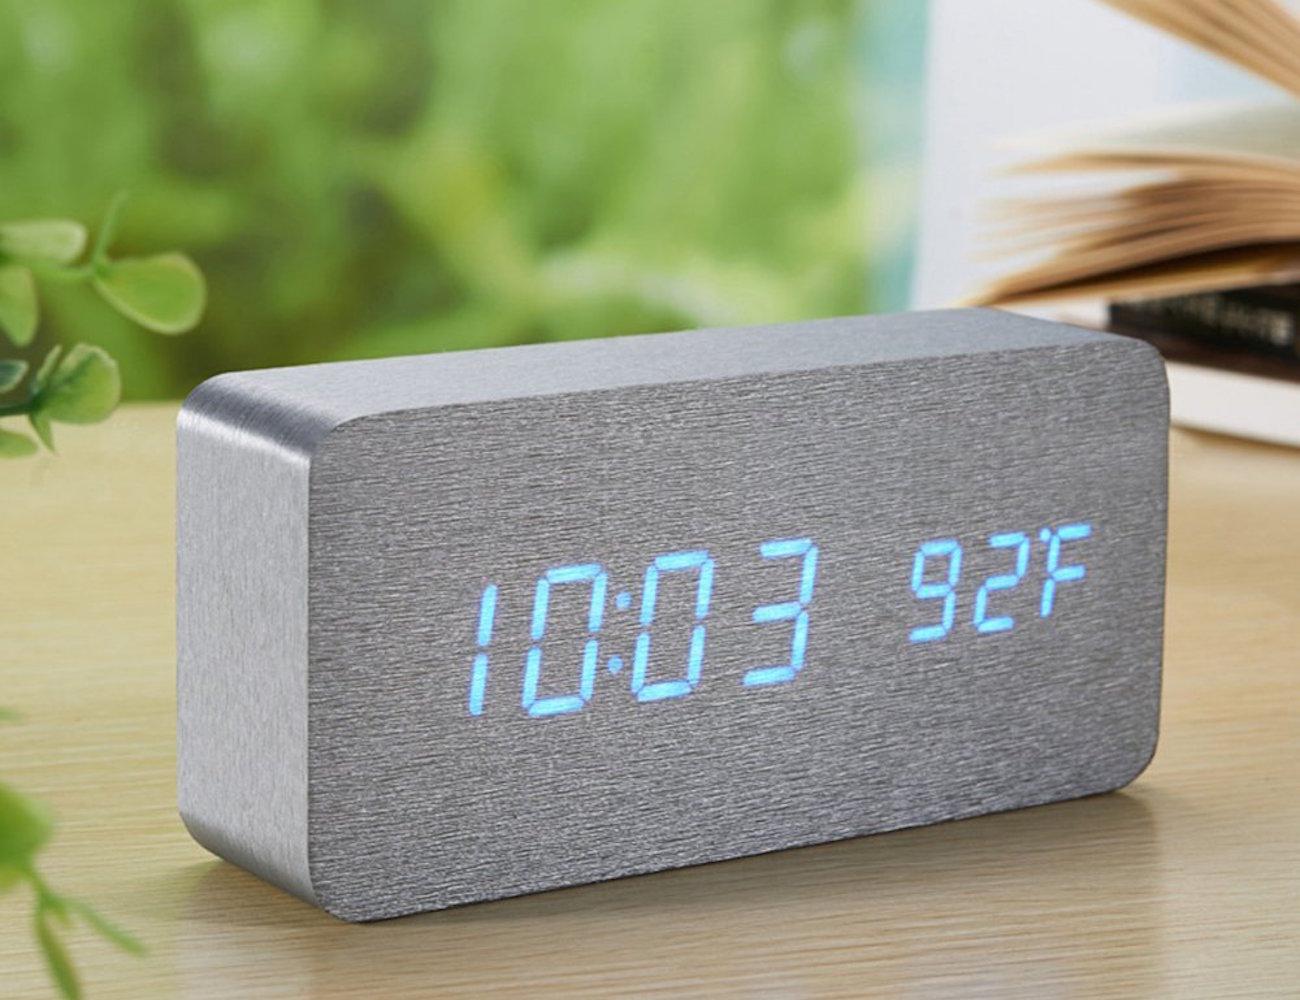 sea-team-wood-imitation-electronic-desk-clock-01